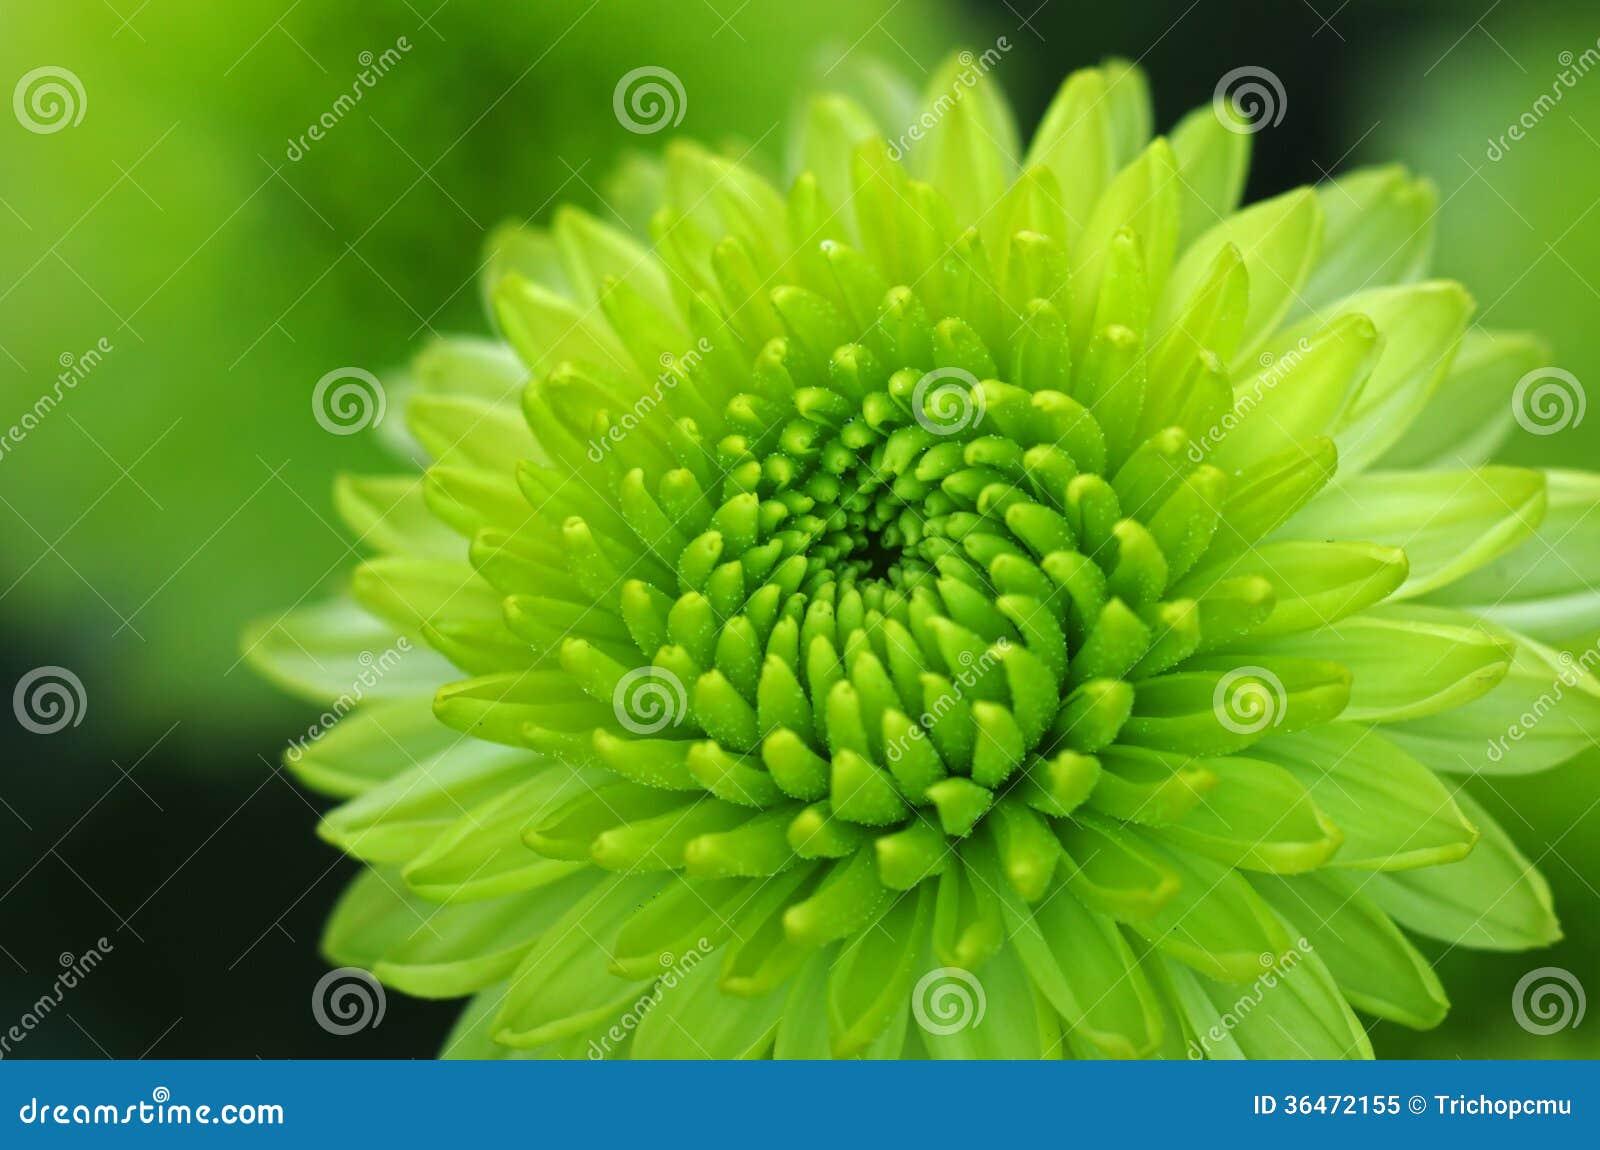 Green Dahlia Flower Close Up Royalty Free Stock Photo ...